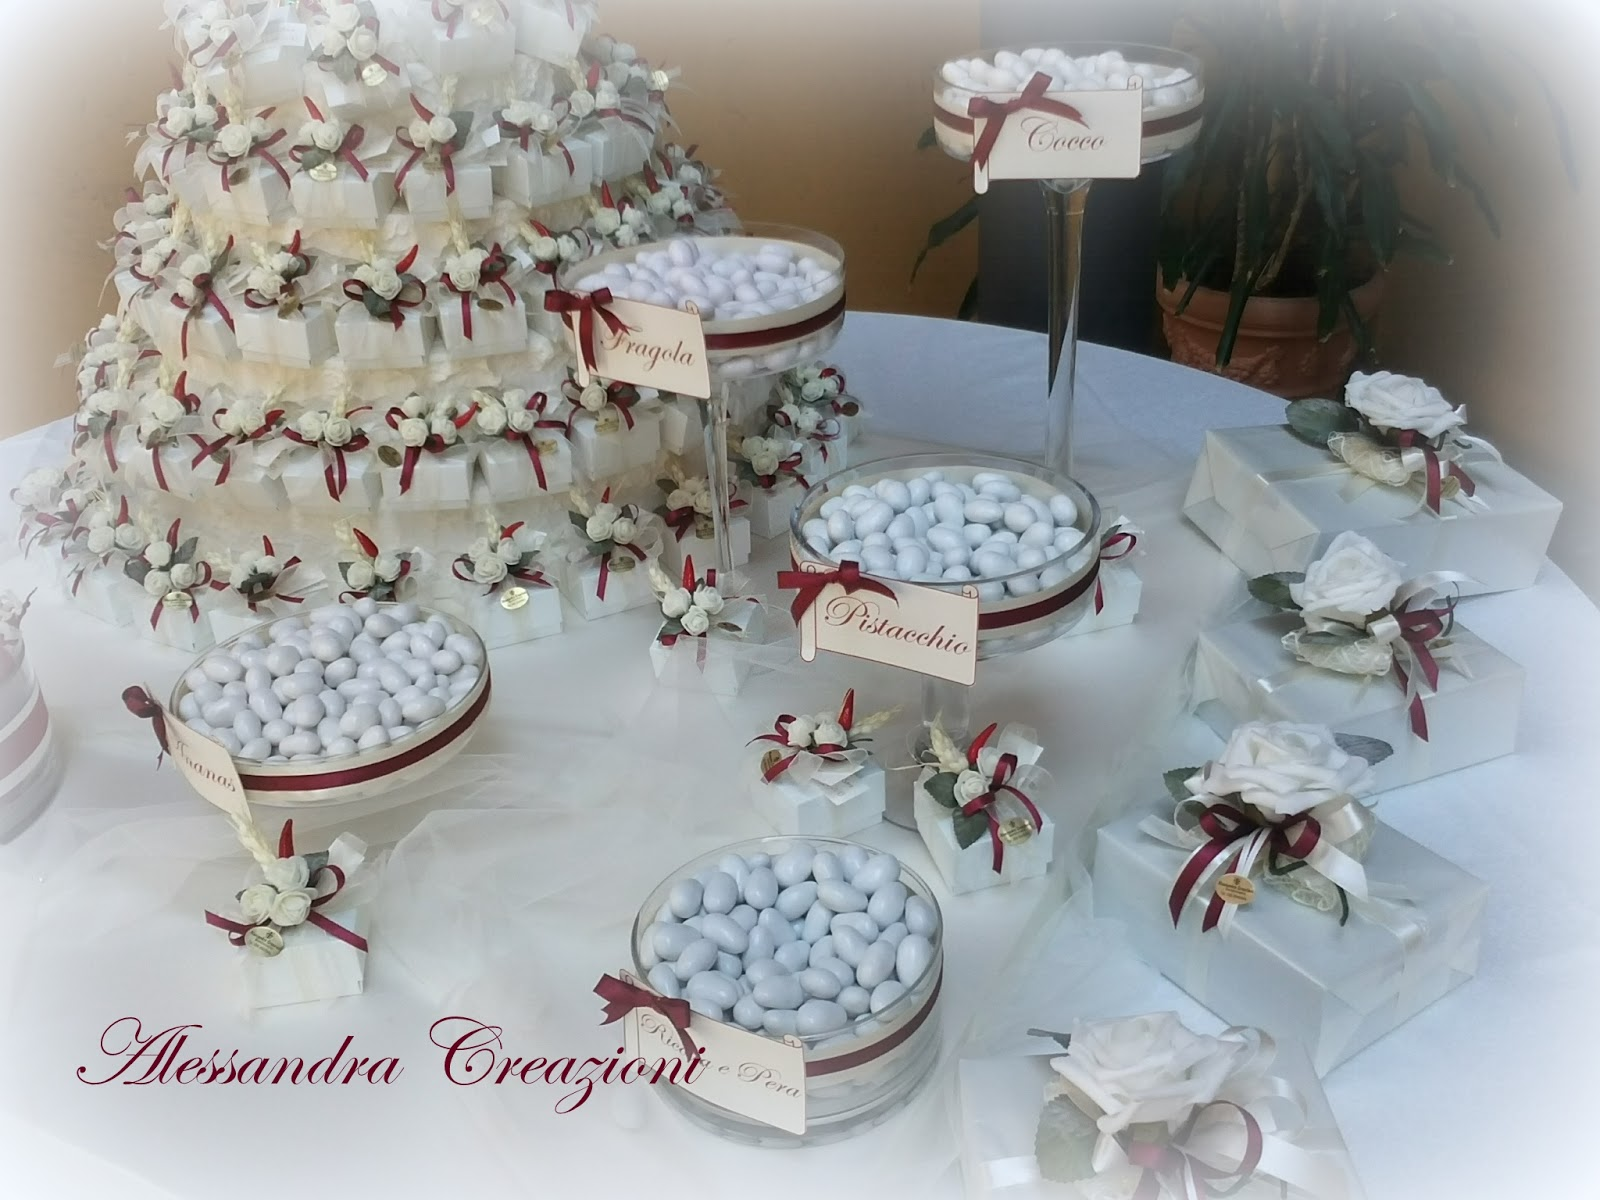 Matrimonio Natale Bomboniere : Bomboniere matrimonio natale sm regardsdefemmes